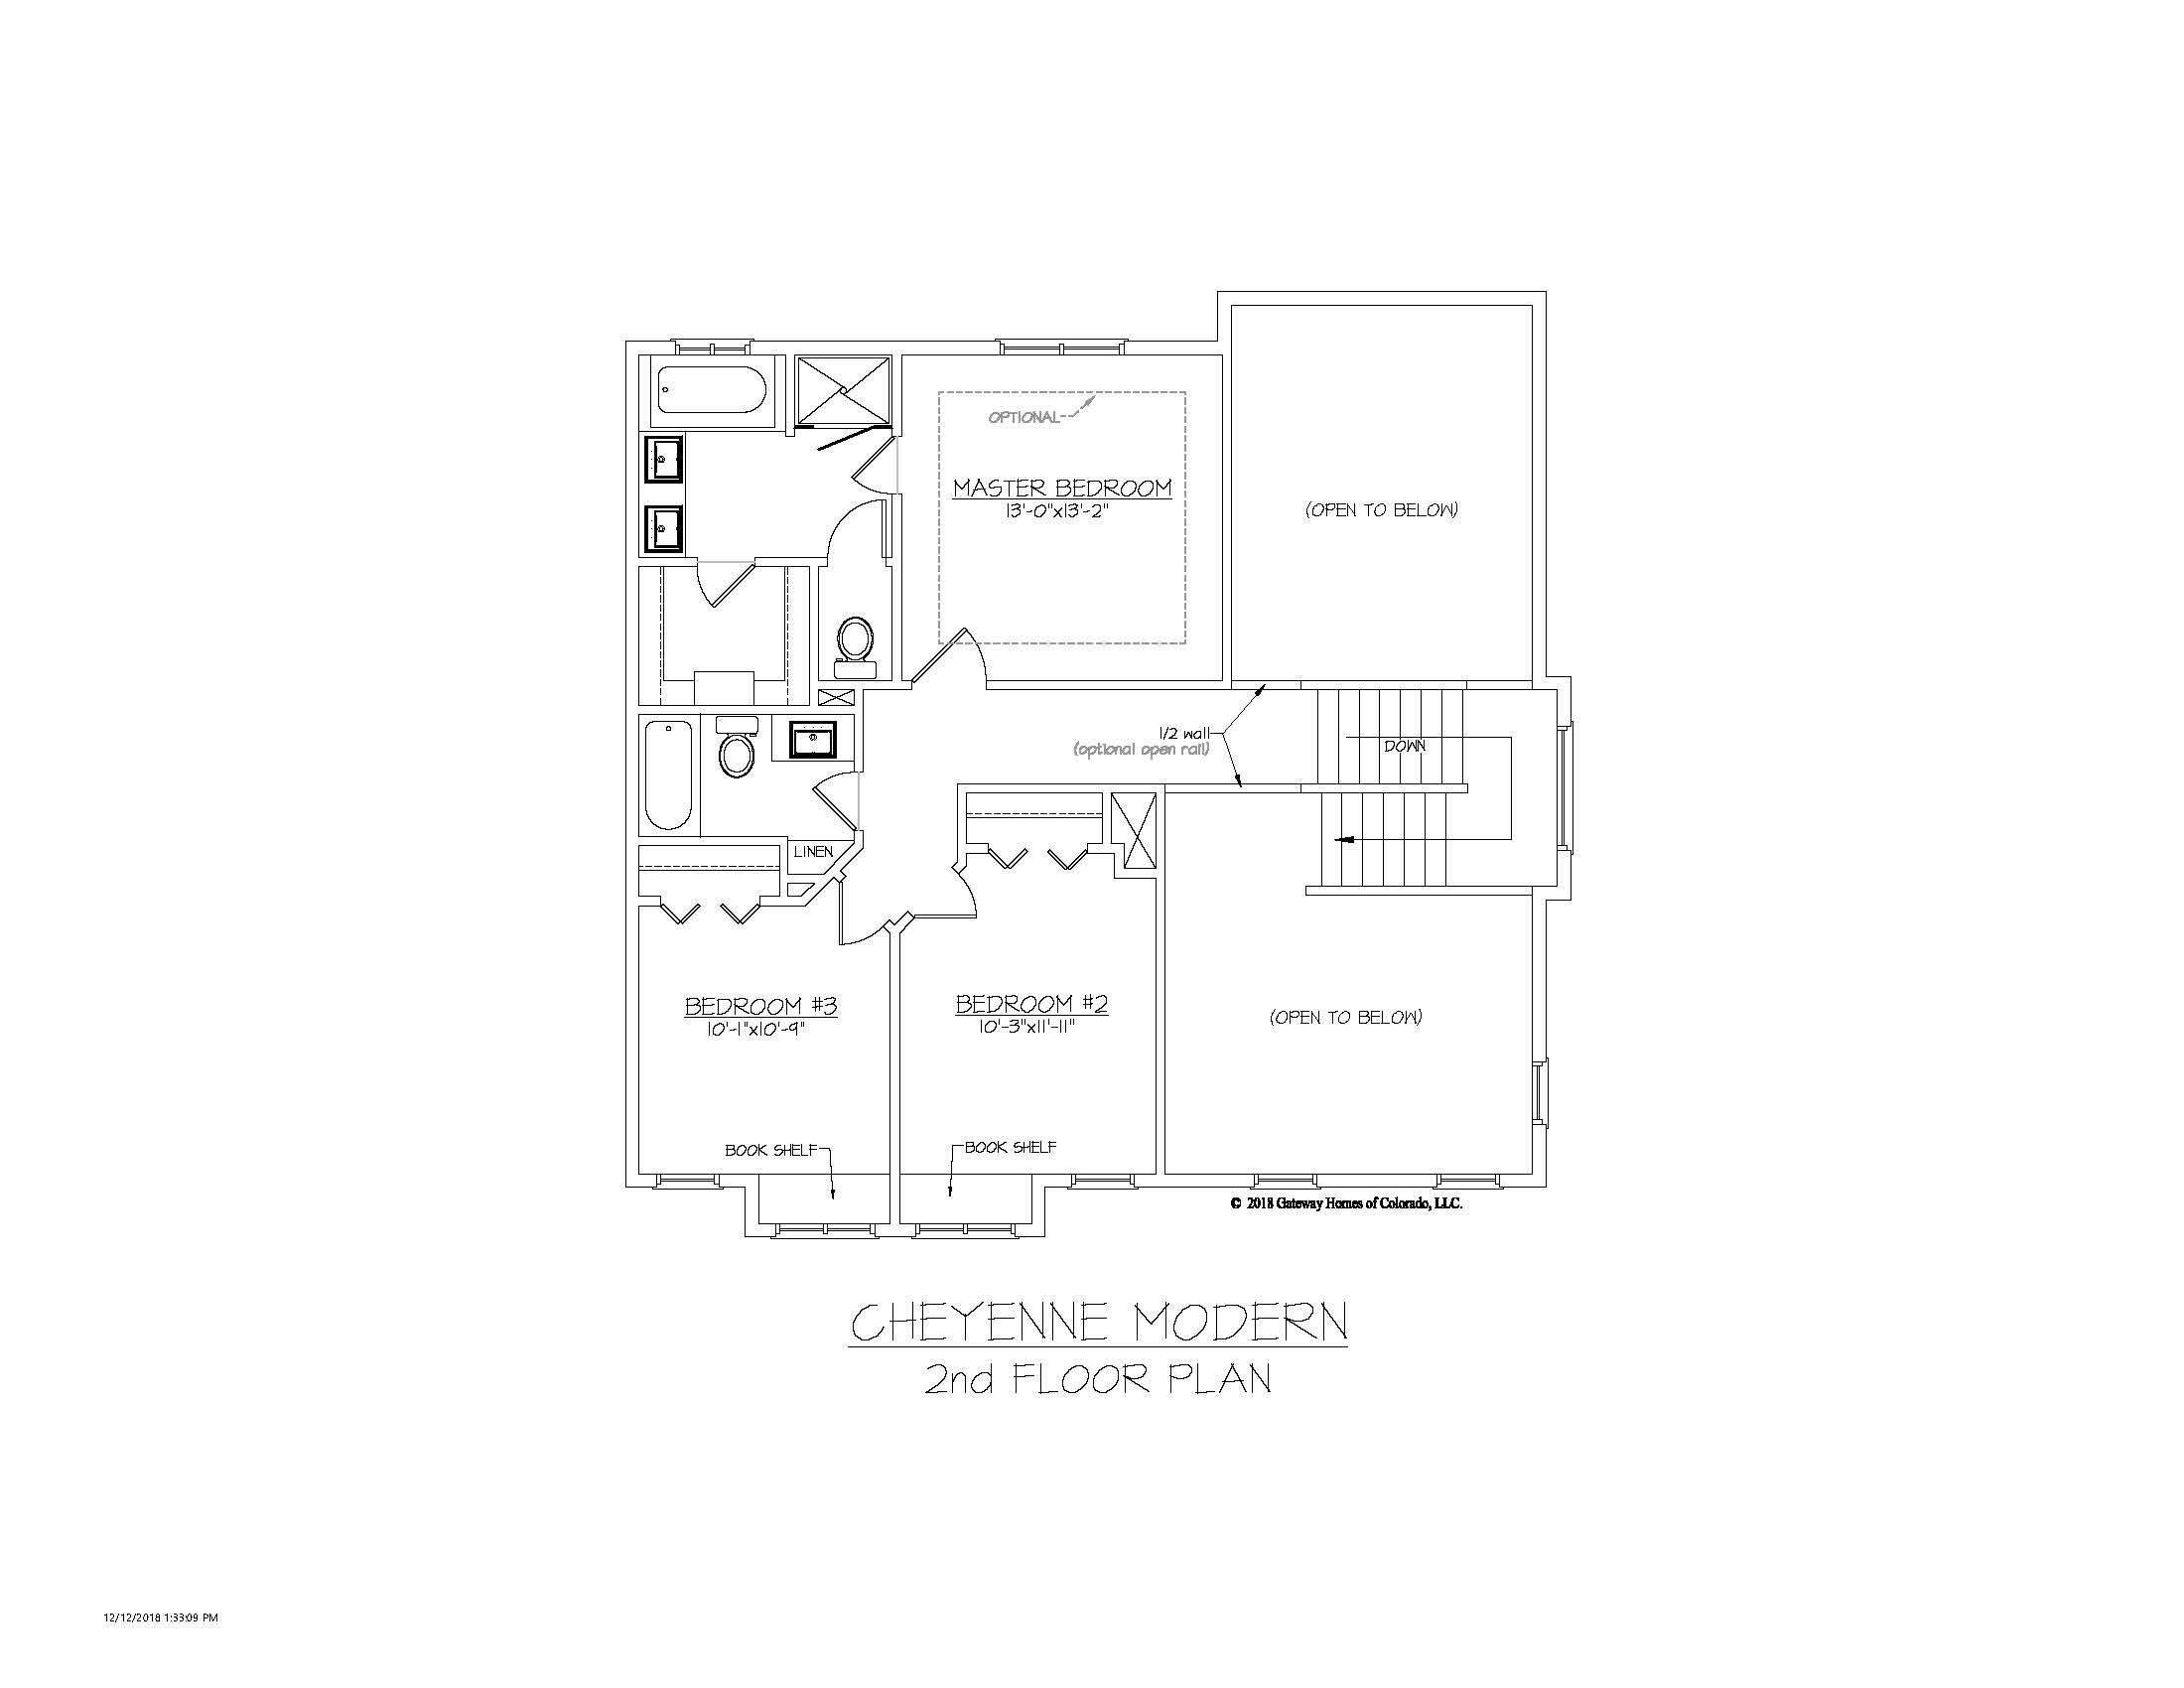 SM Cheyenne Modern 2nd Floor Plan